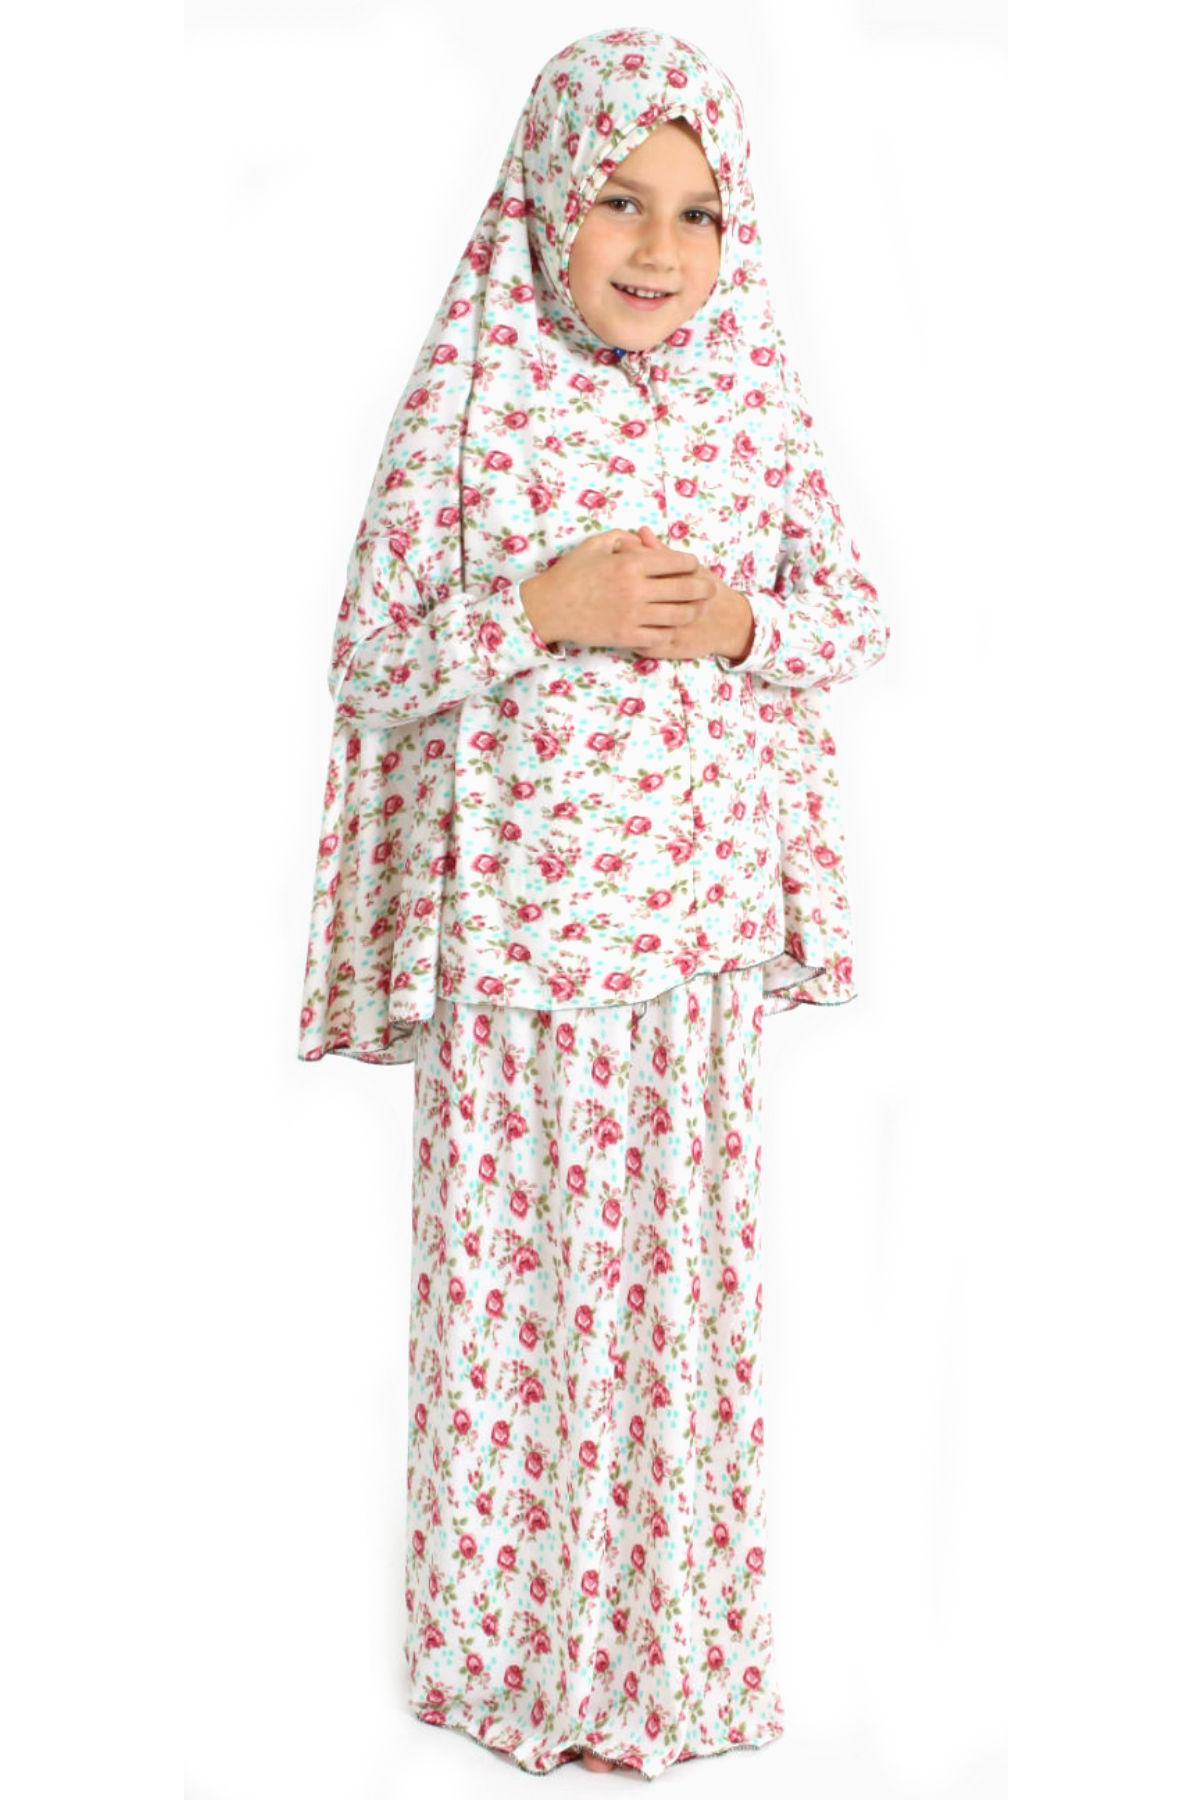 Takbir Barn Bönekläder